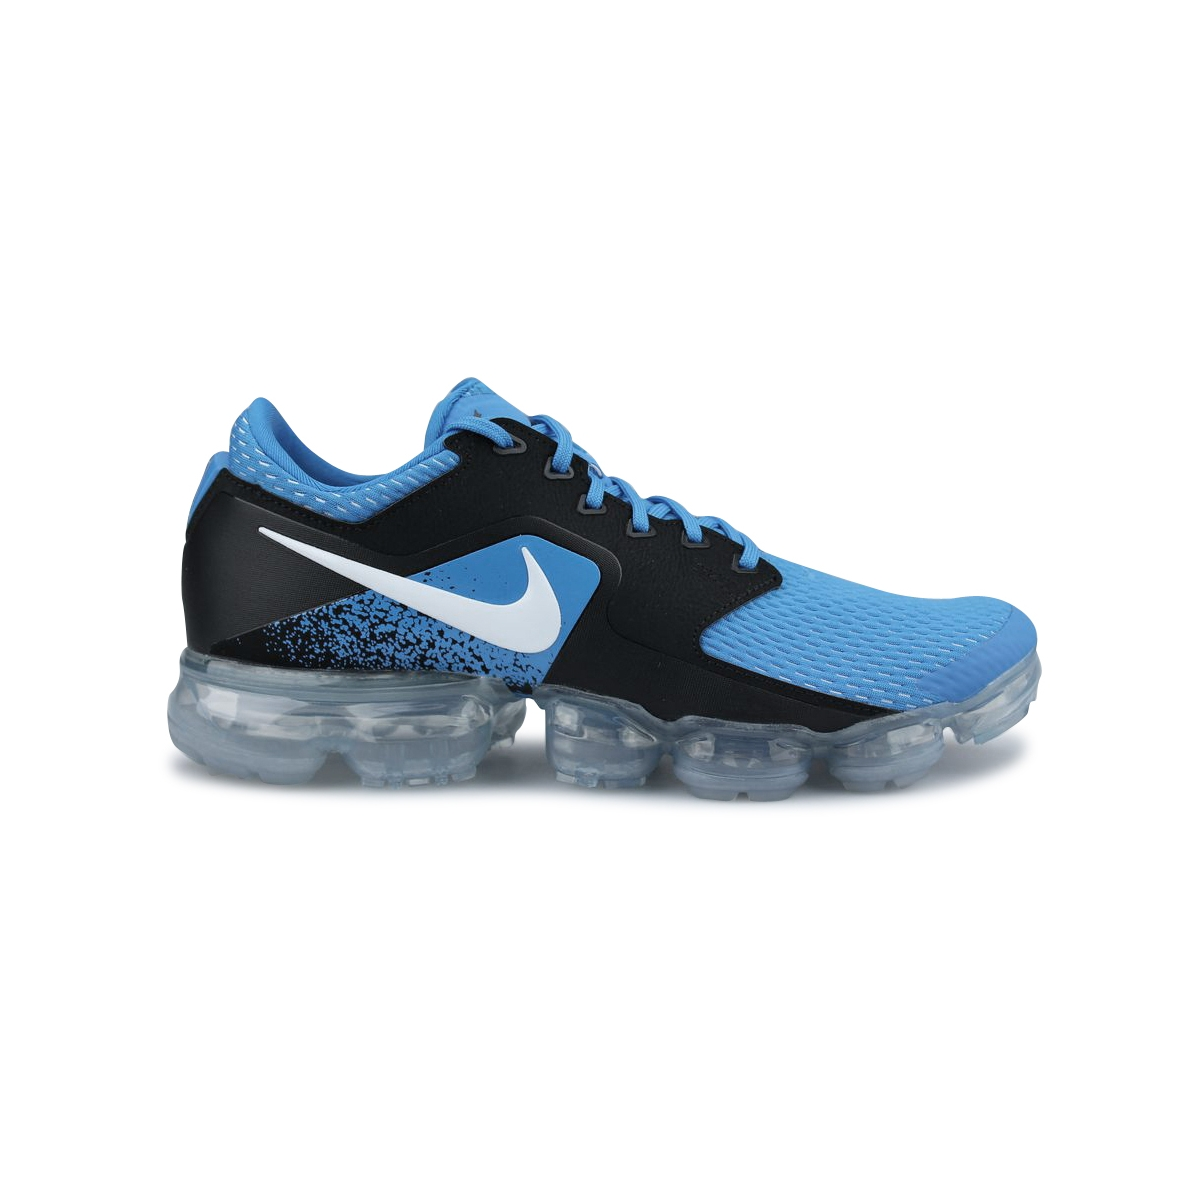 sneakers for cheap 54d98 7d5b2 NIKE AIR VAPORMAX BLEU AH9046-400. Loading zoom